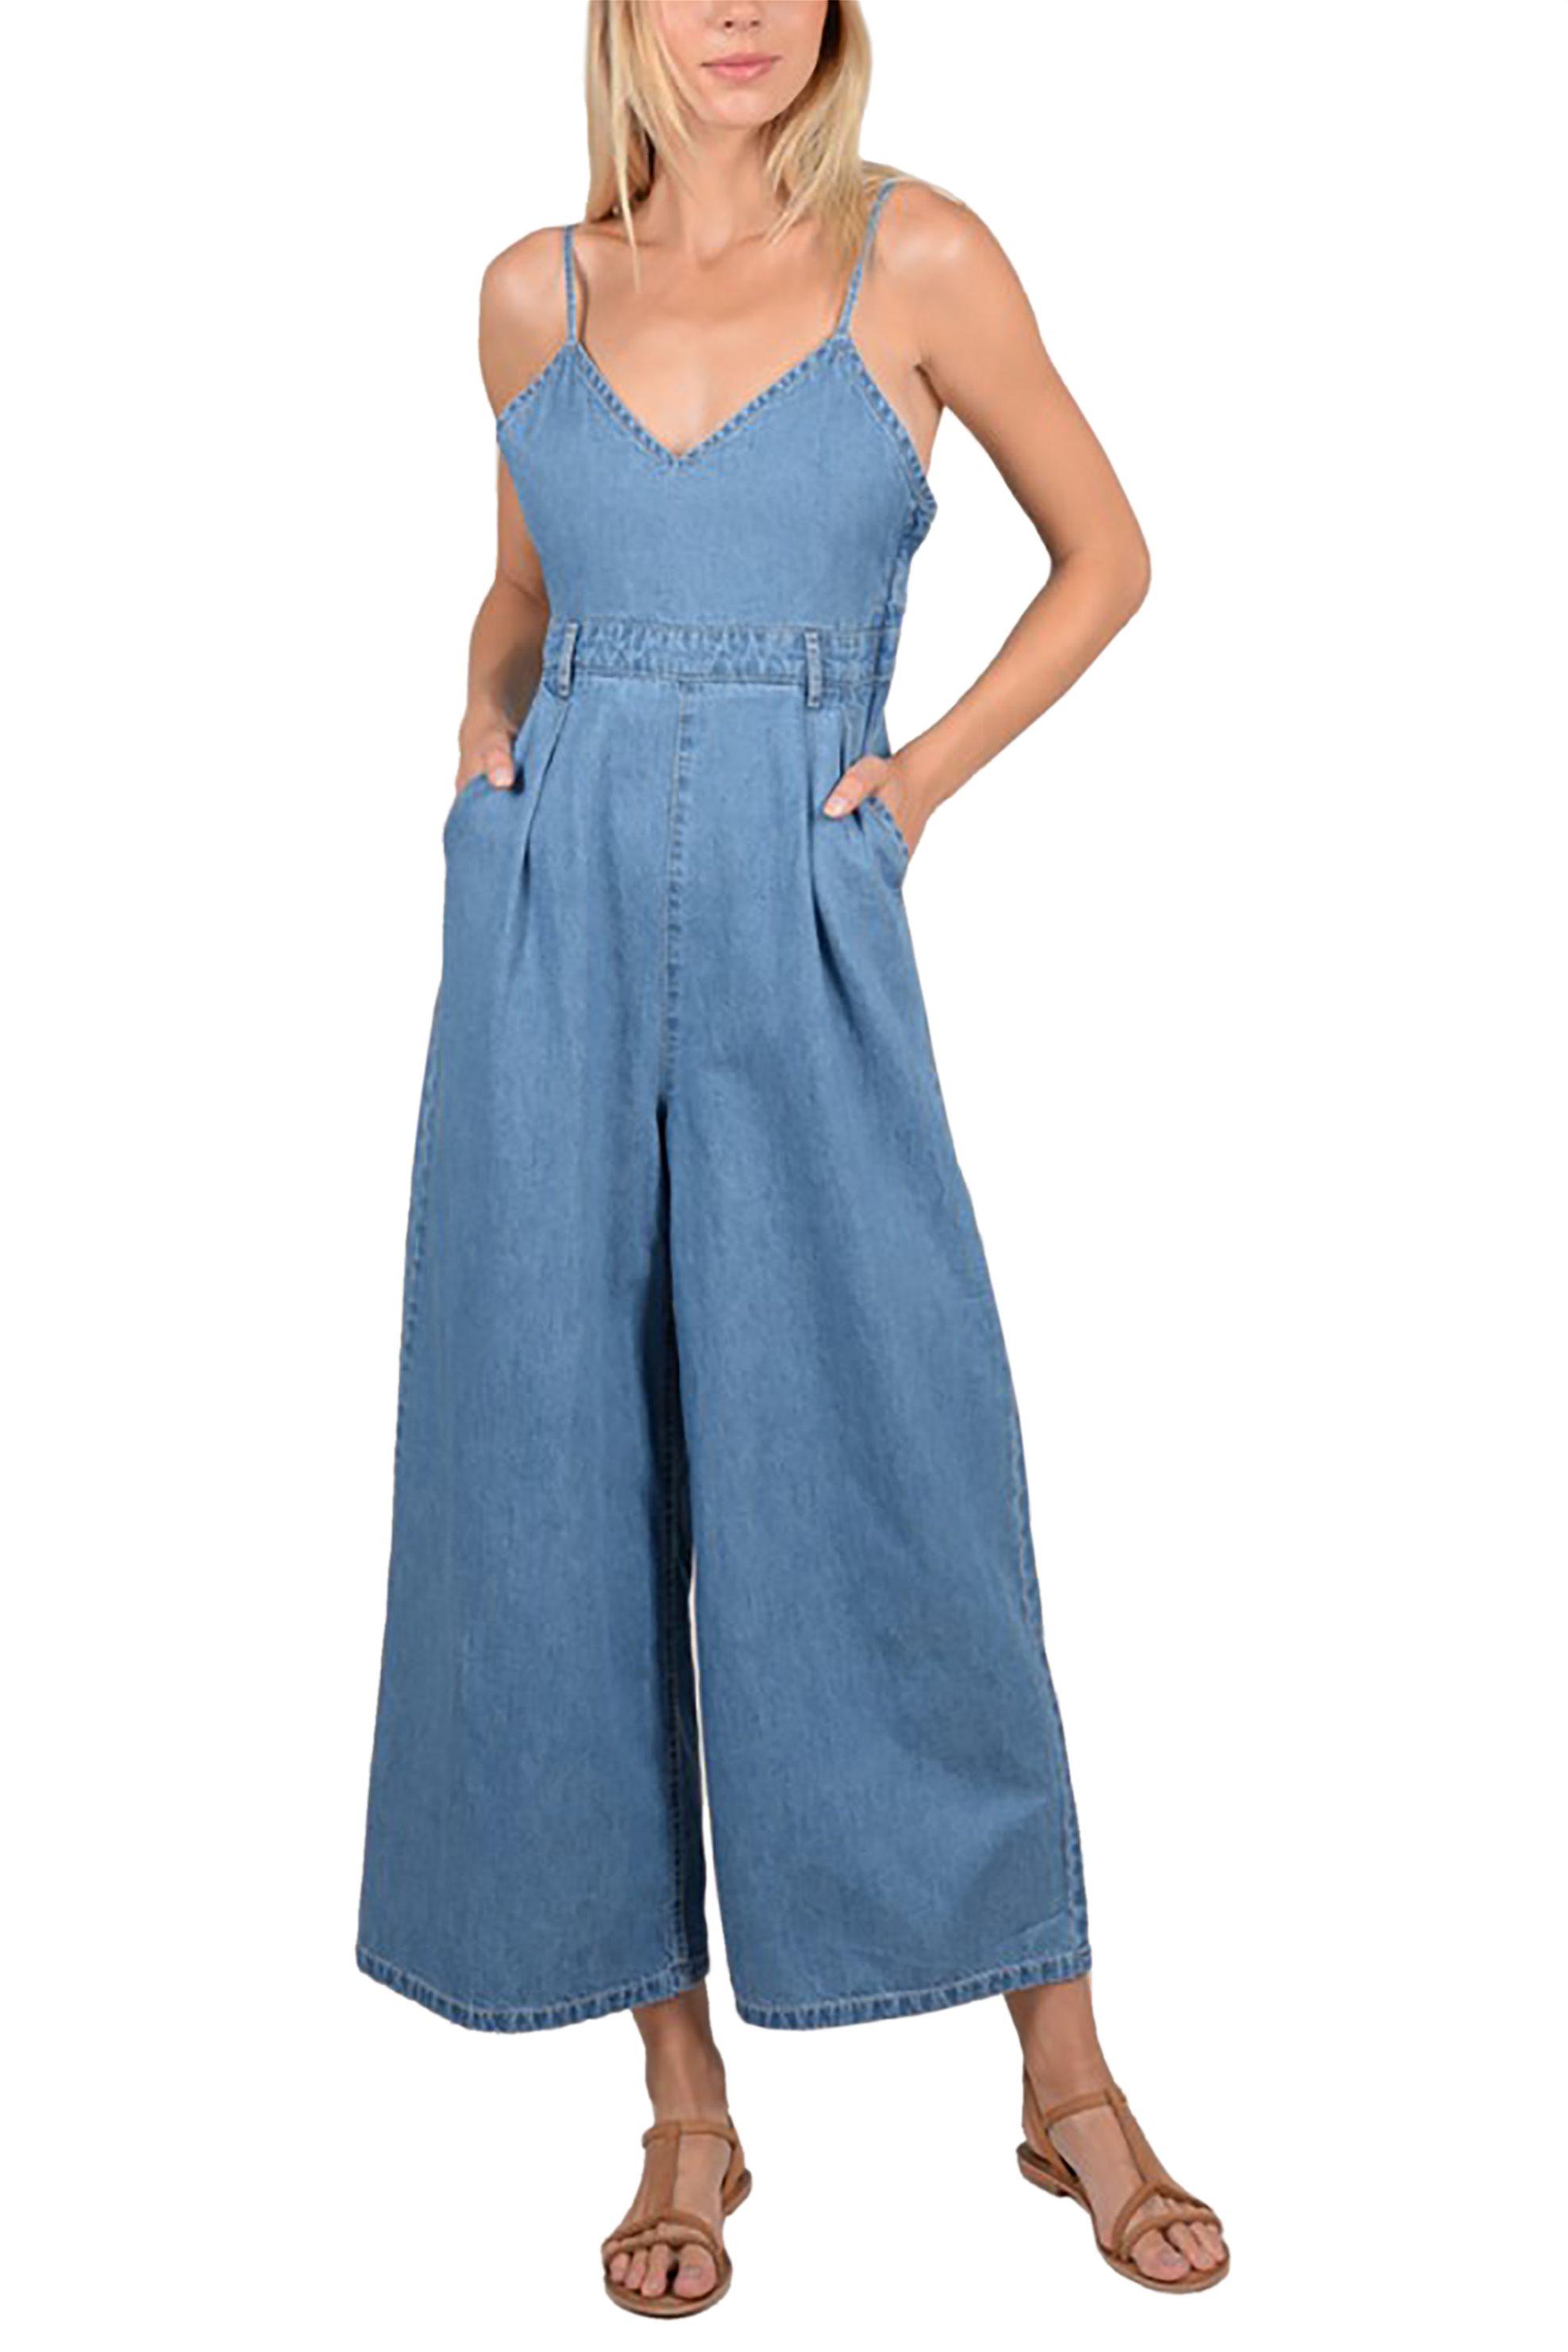 Molly Bracken γυναικεία denim ολόσωμη φόρμα - S19MB-E1105 - Μπλε γυναικα   ρουχα   ολόσωμες φόρμες   σαλοπέτες